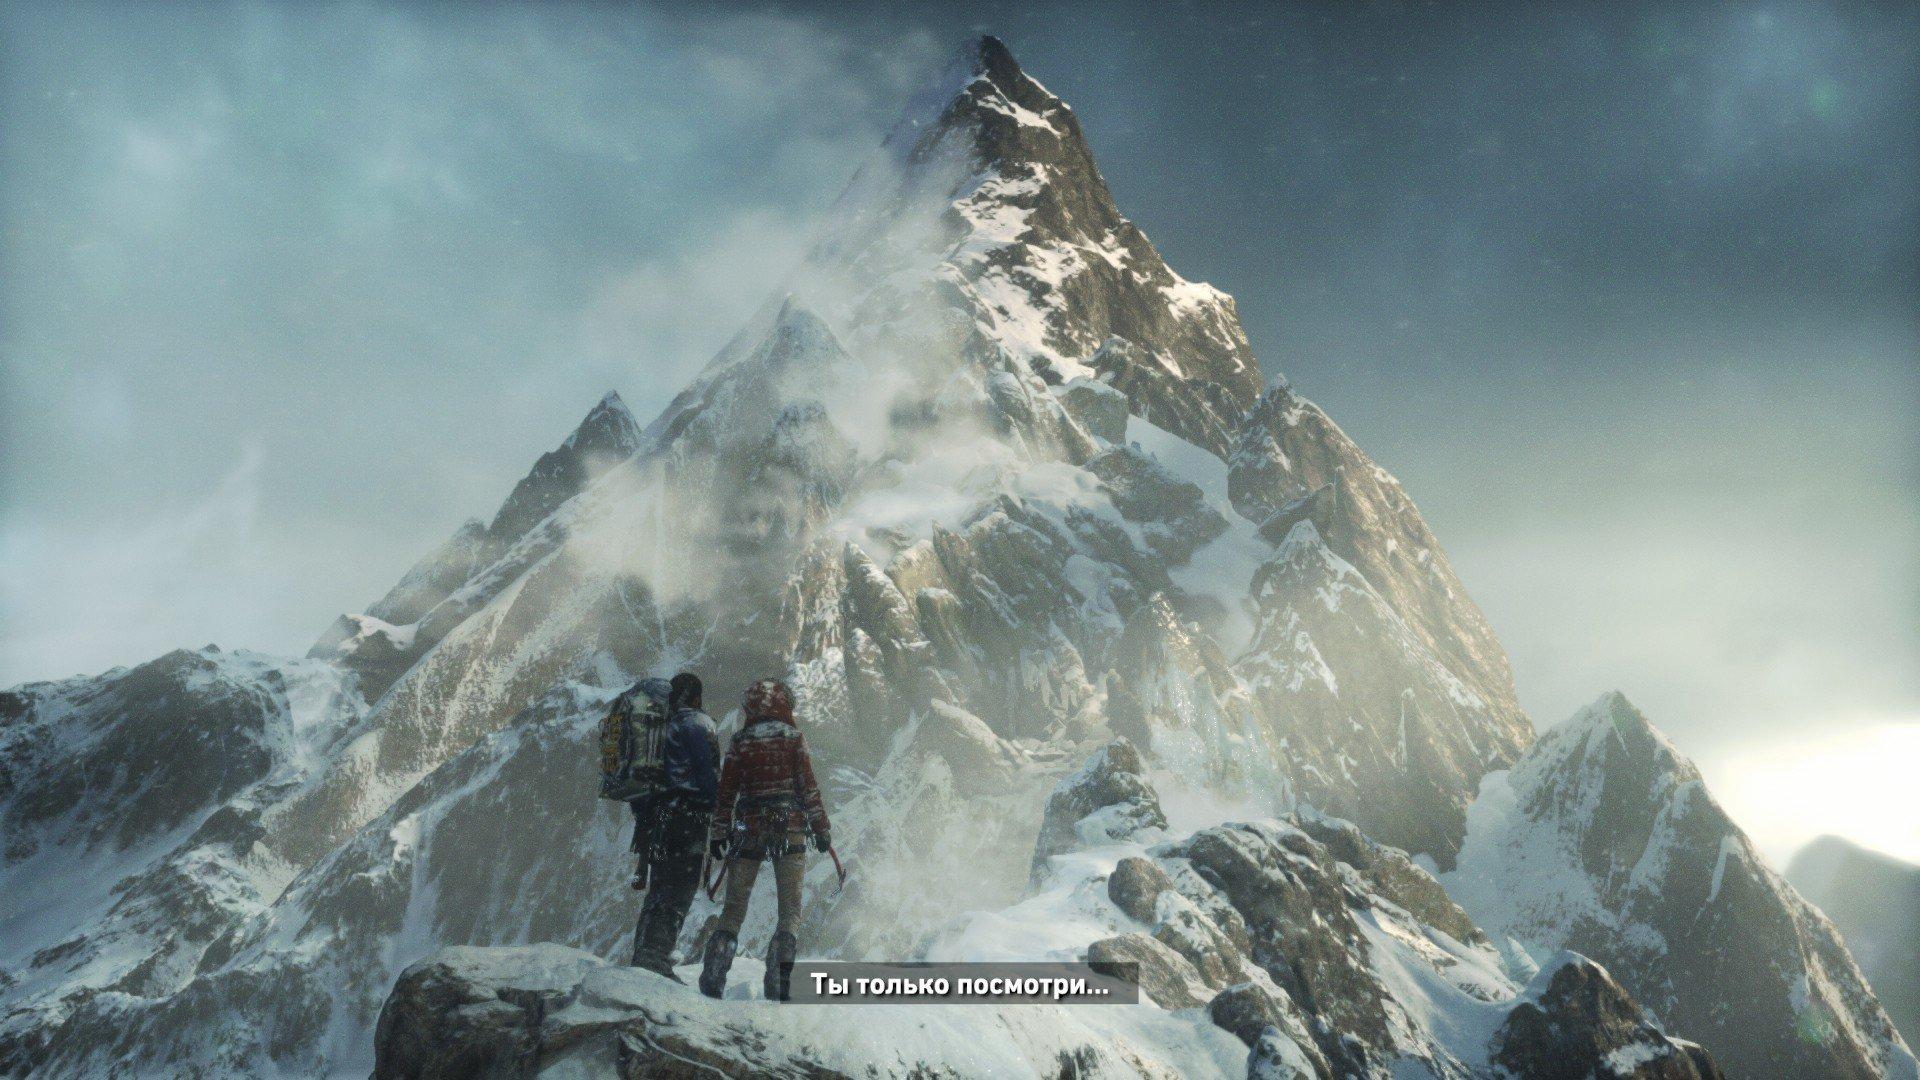 Rise of the Tomb Raider или да когда же этот медведь сдохнет?. - Изображение 34